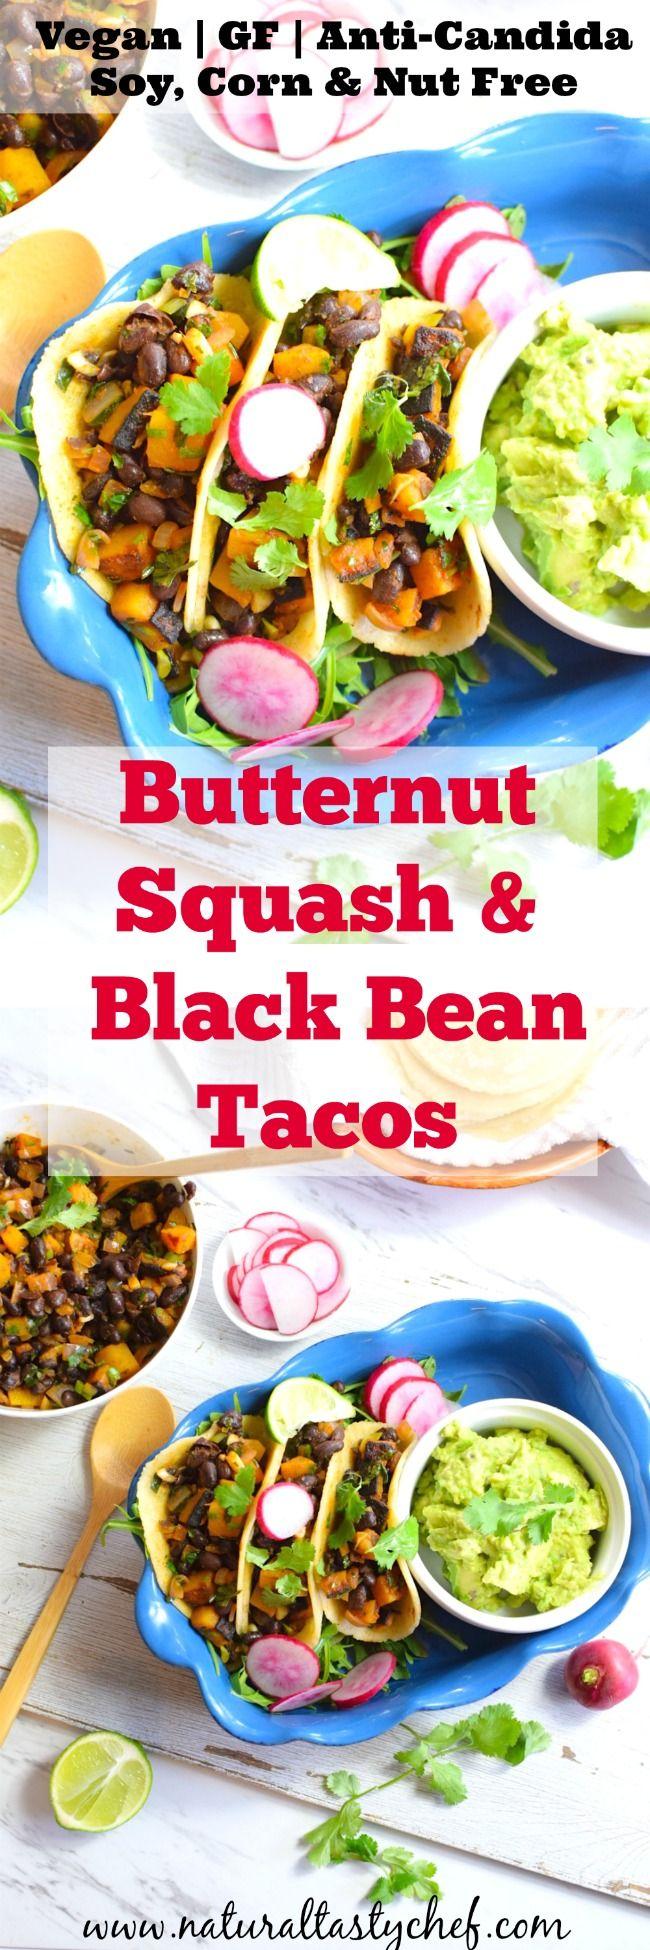 Butternut Squash and Black Bean Tacos | Recipe | Vegan